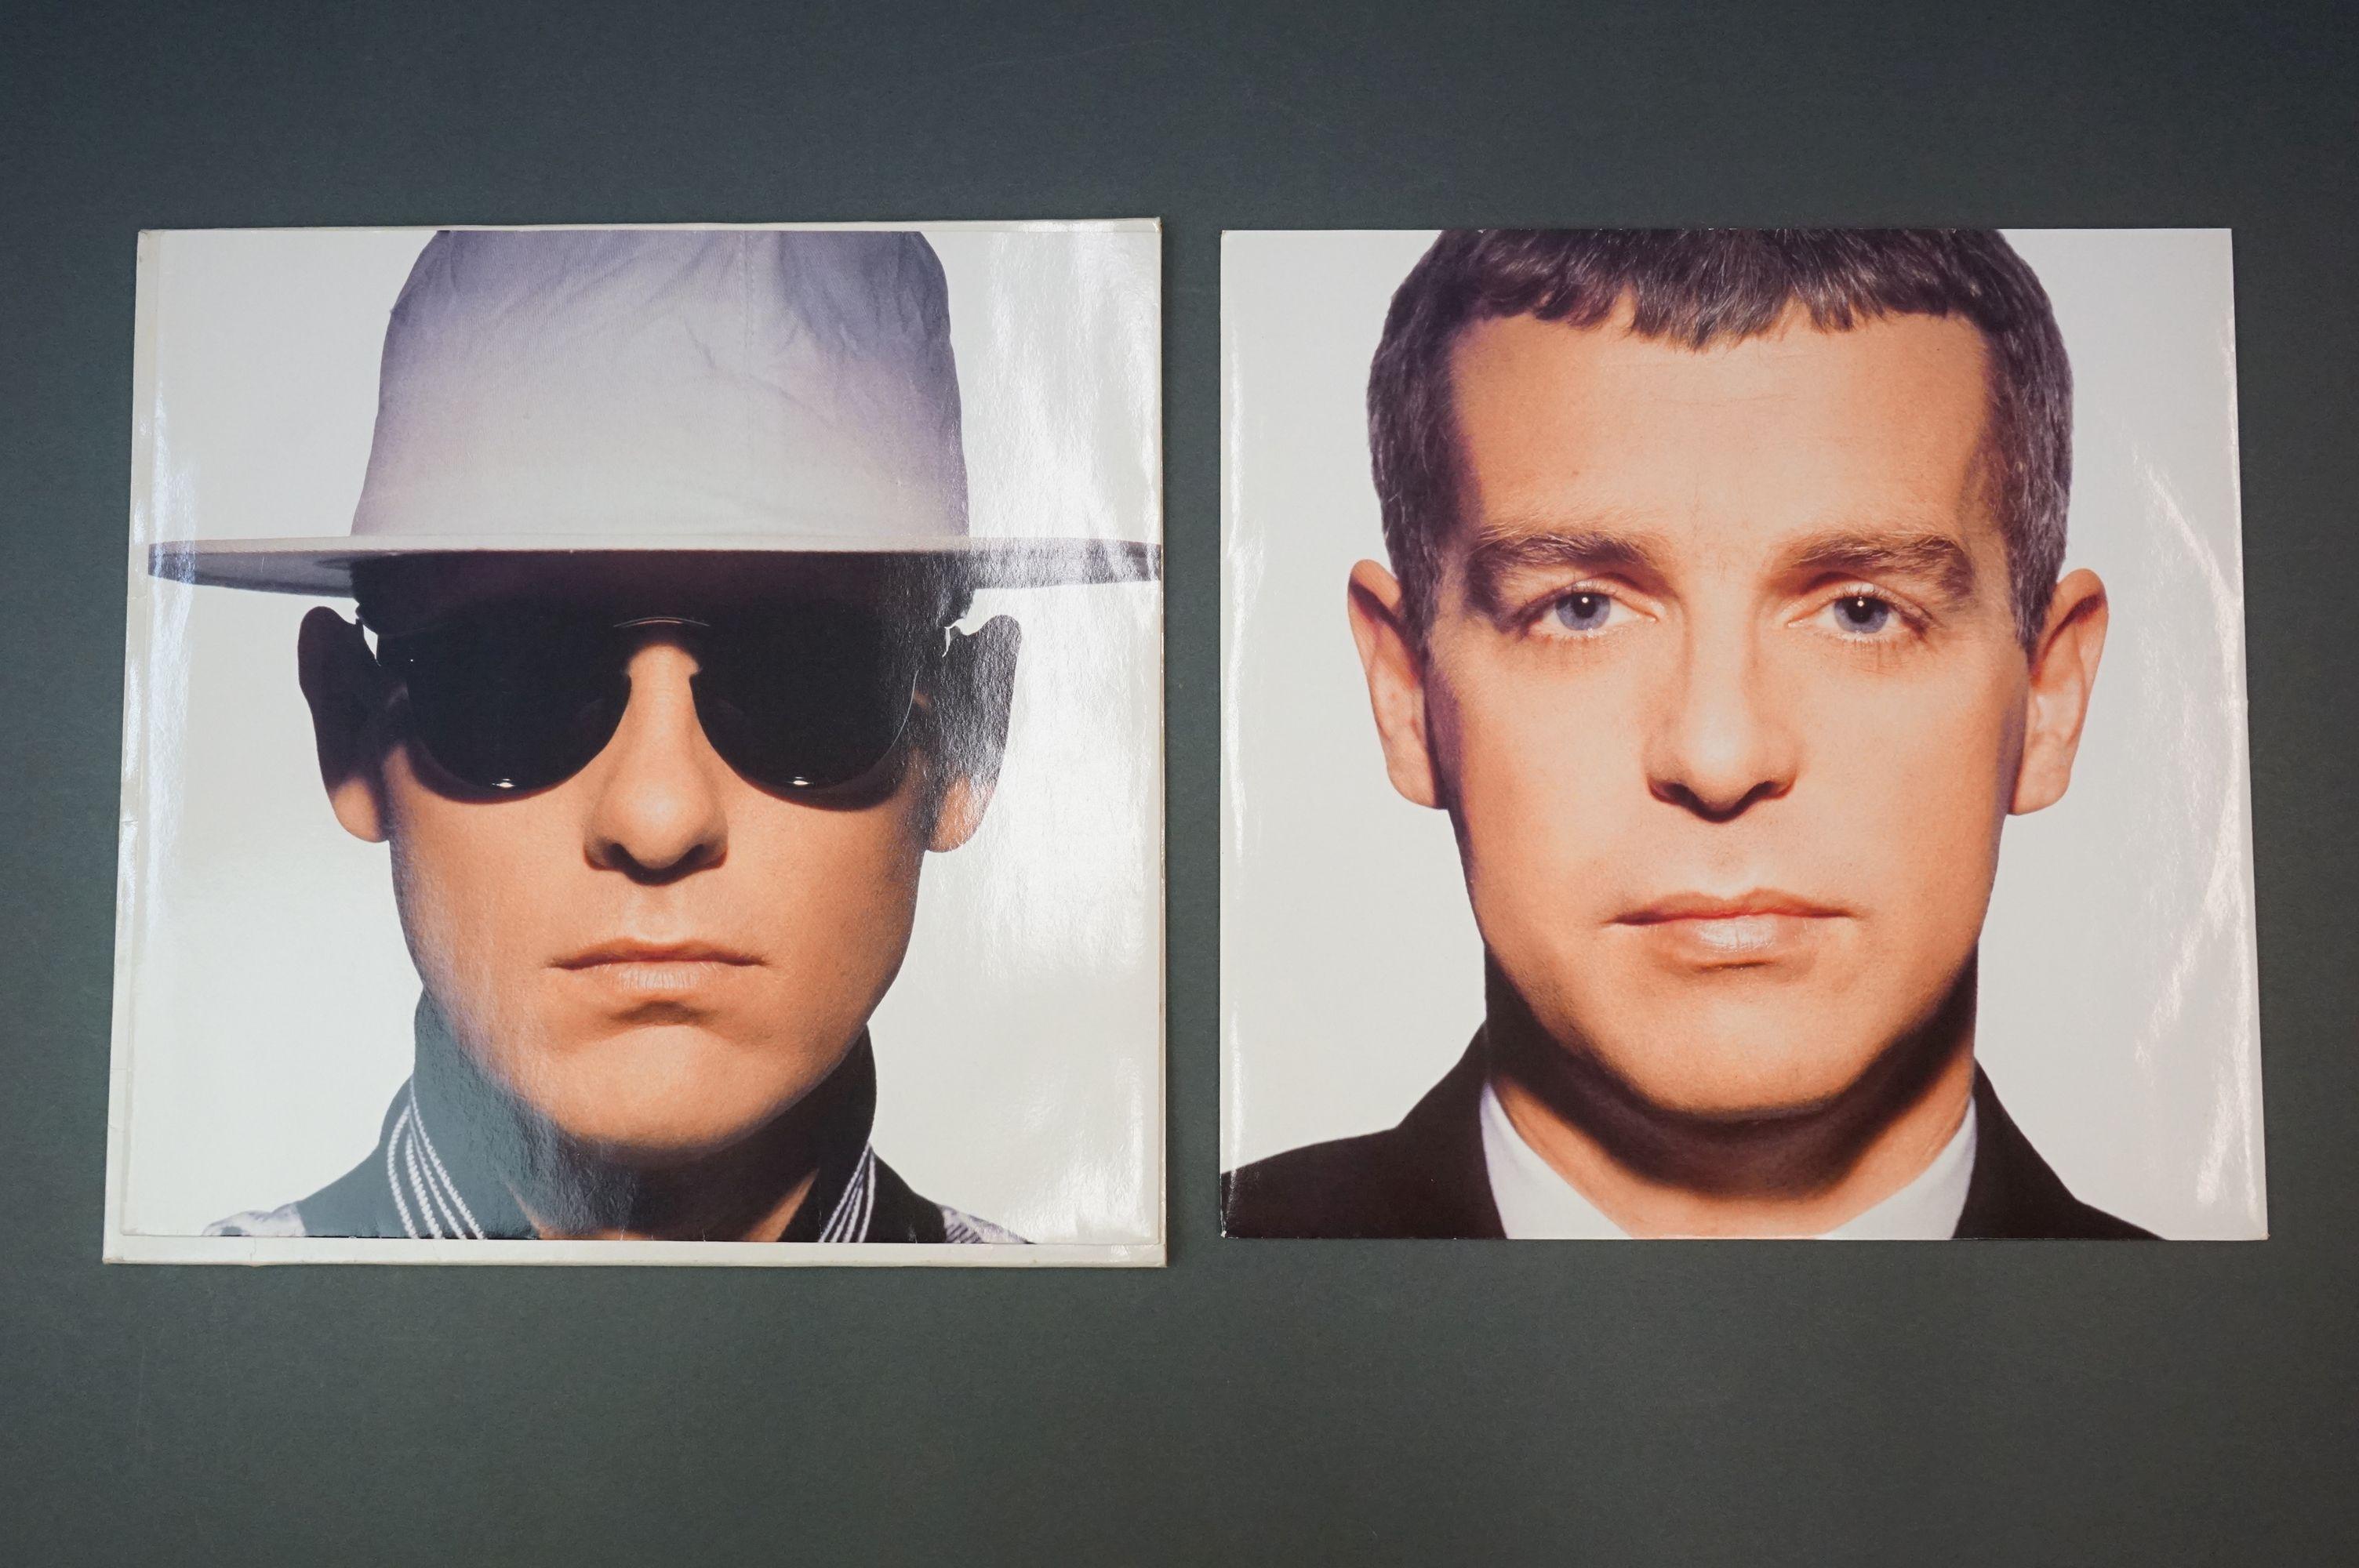 Vinyl - Pet Shop Boys Discography Double Album on Parlophone PMTV3 in sleeves ex, vinyl vg+ - Image 2 of 6